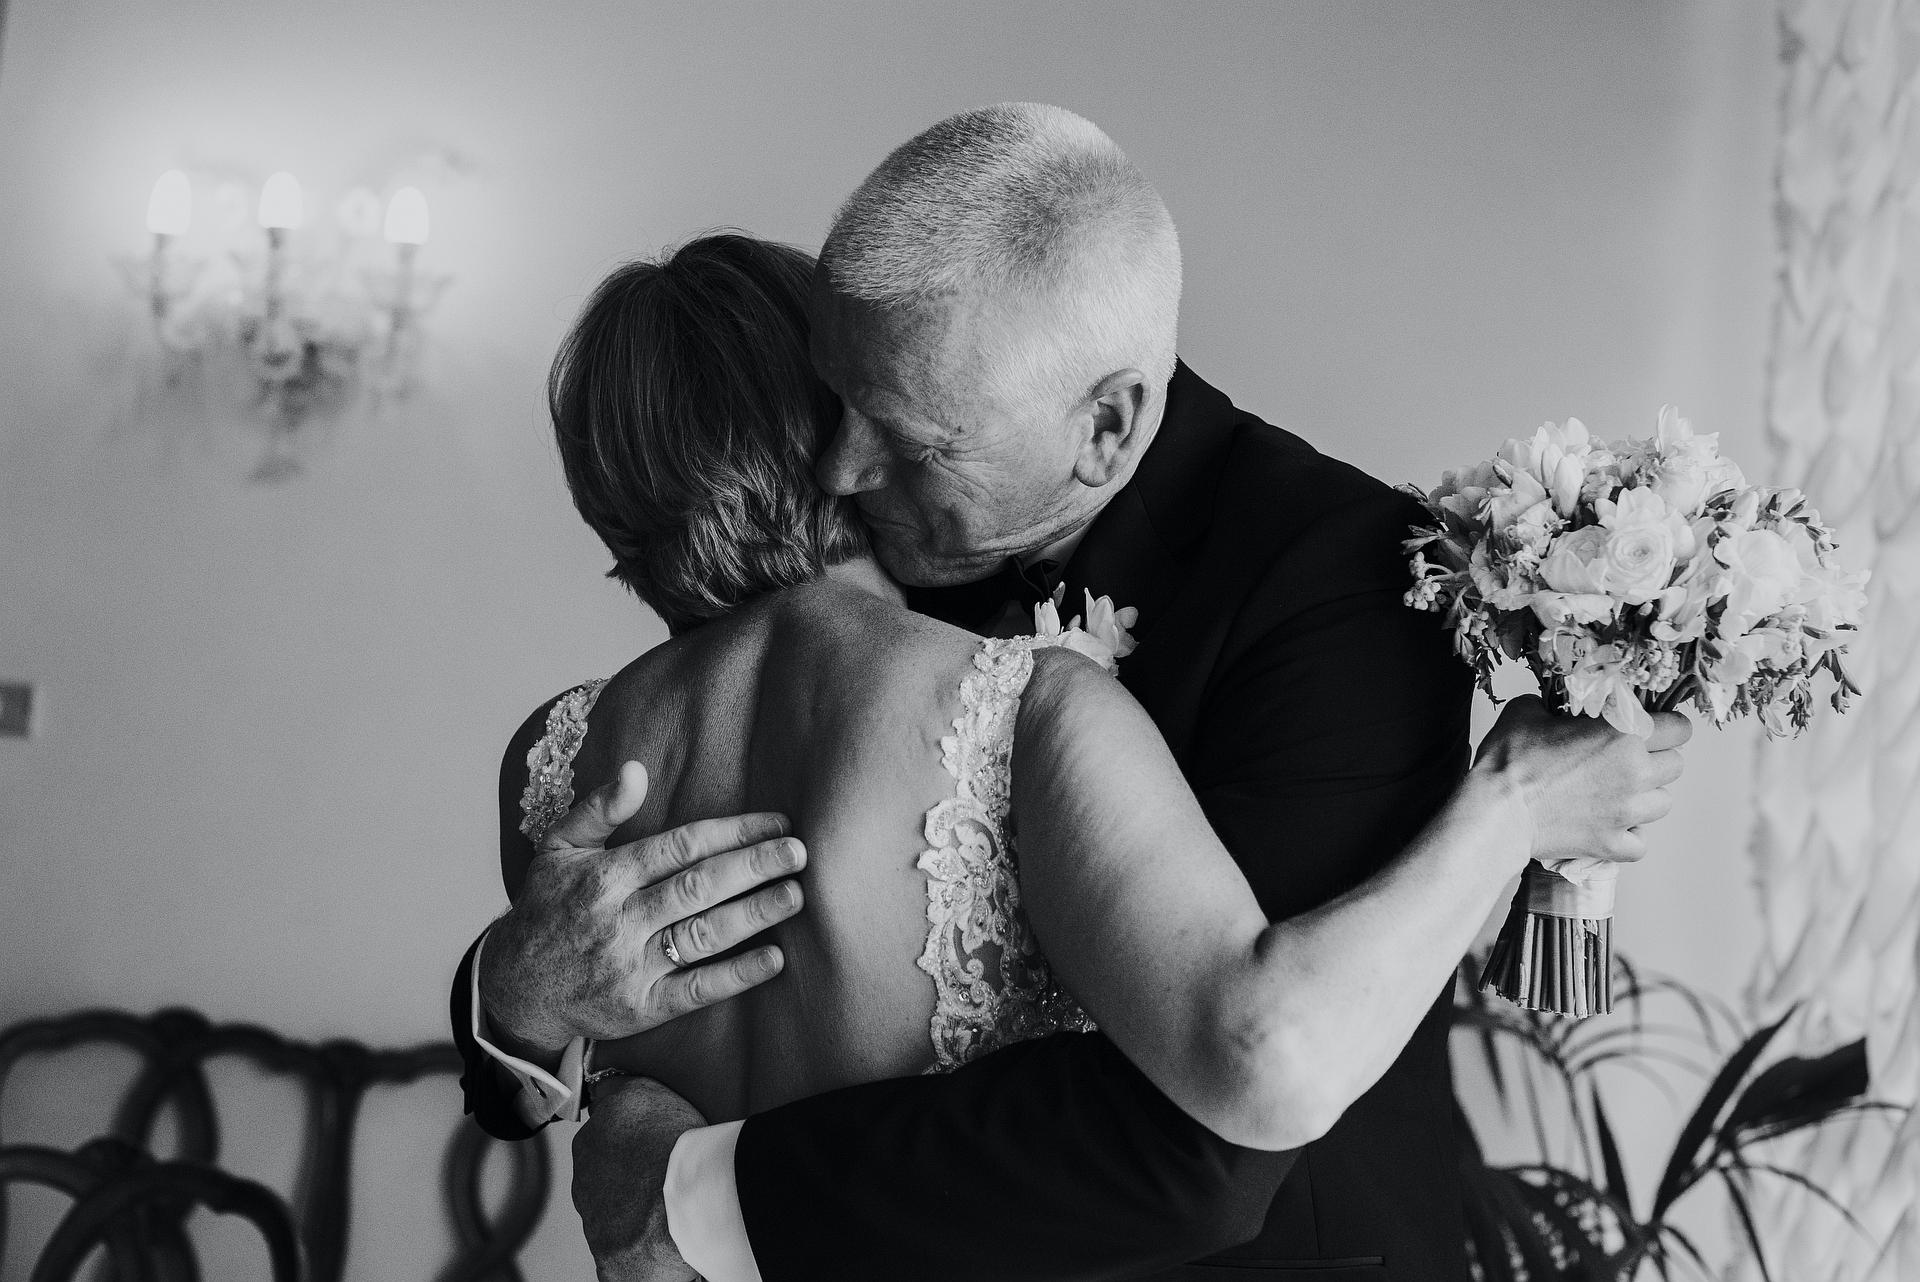 Venezia, Italy Town Hall Elopement Ceremony Photo   A congratulates hug for the bride